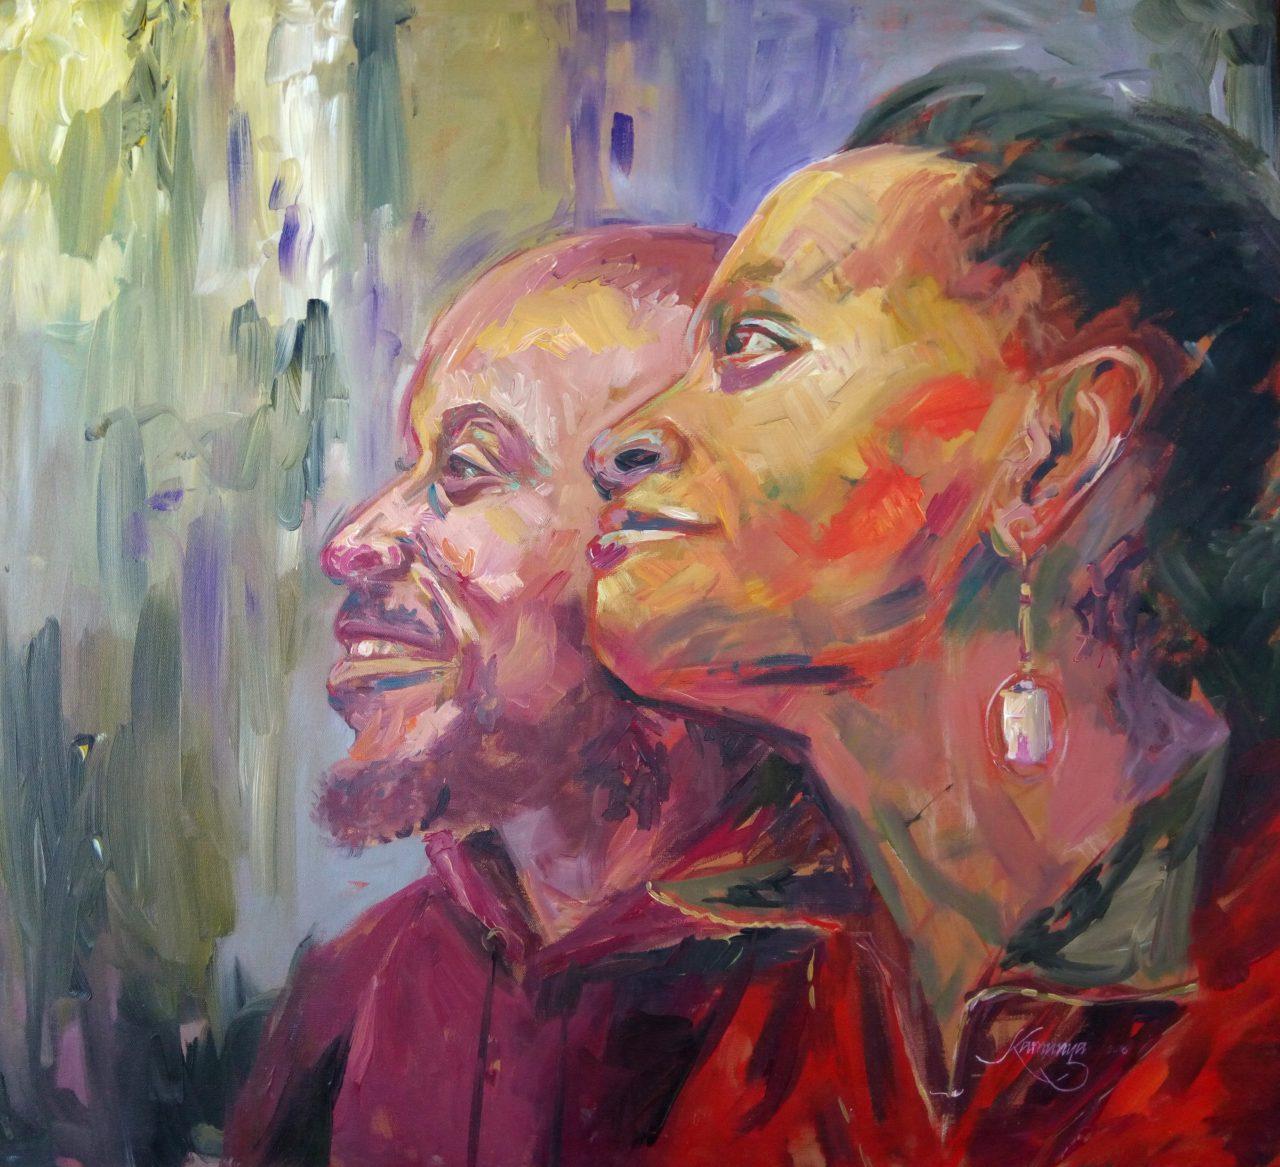 Kenya Festive Portraits Offer